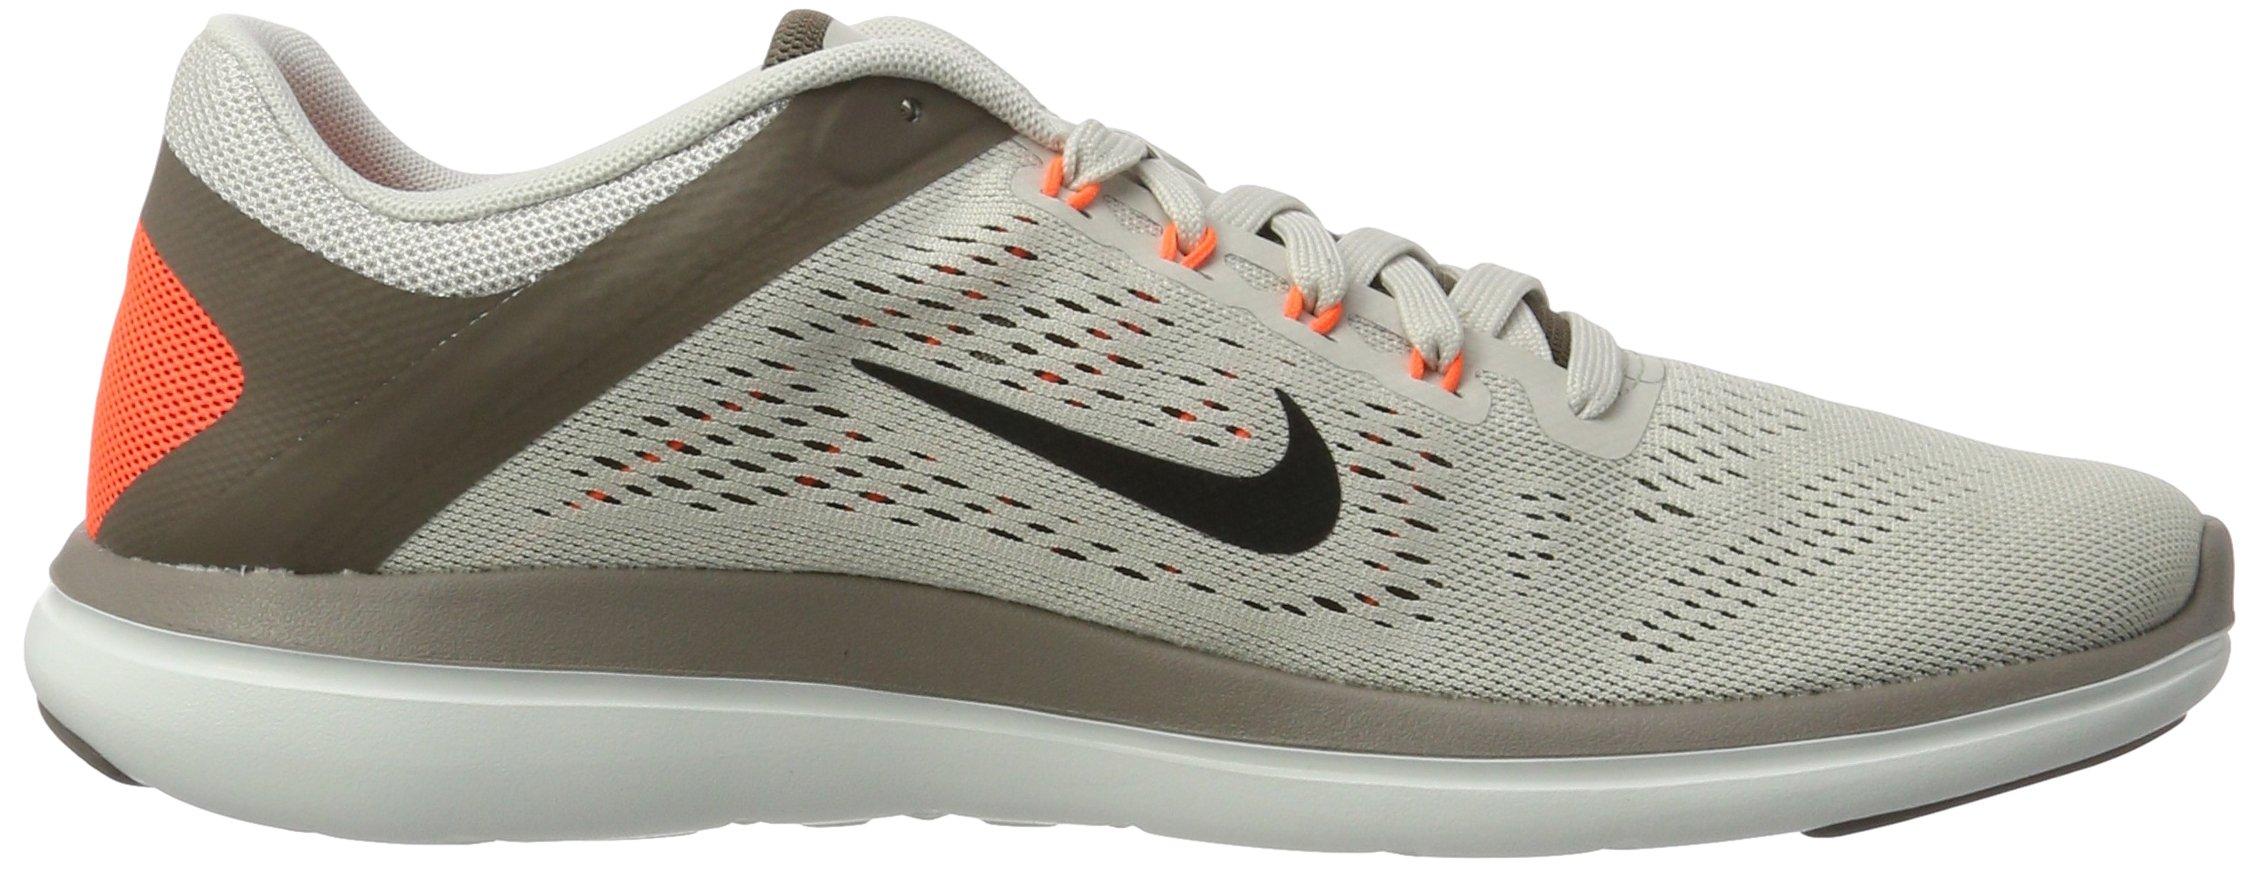 Nike Mens Flex 2016 RN Running Shoe Light Bone/Dark Mushroom/Hyper Orange/Black 8.5 D(M) US by NIKE (Image #6)